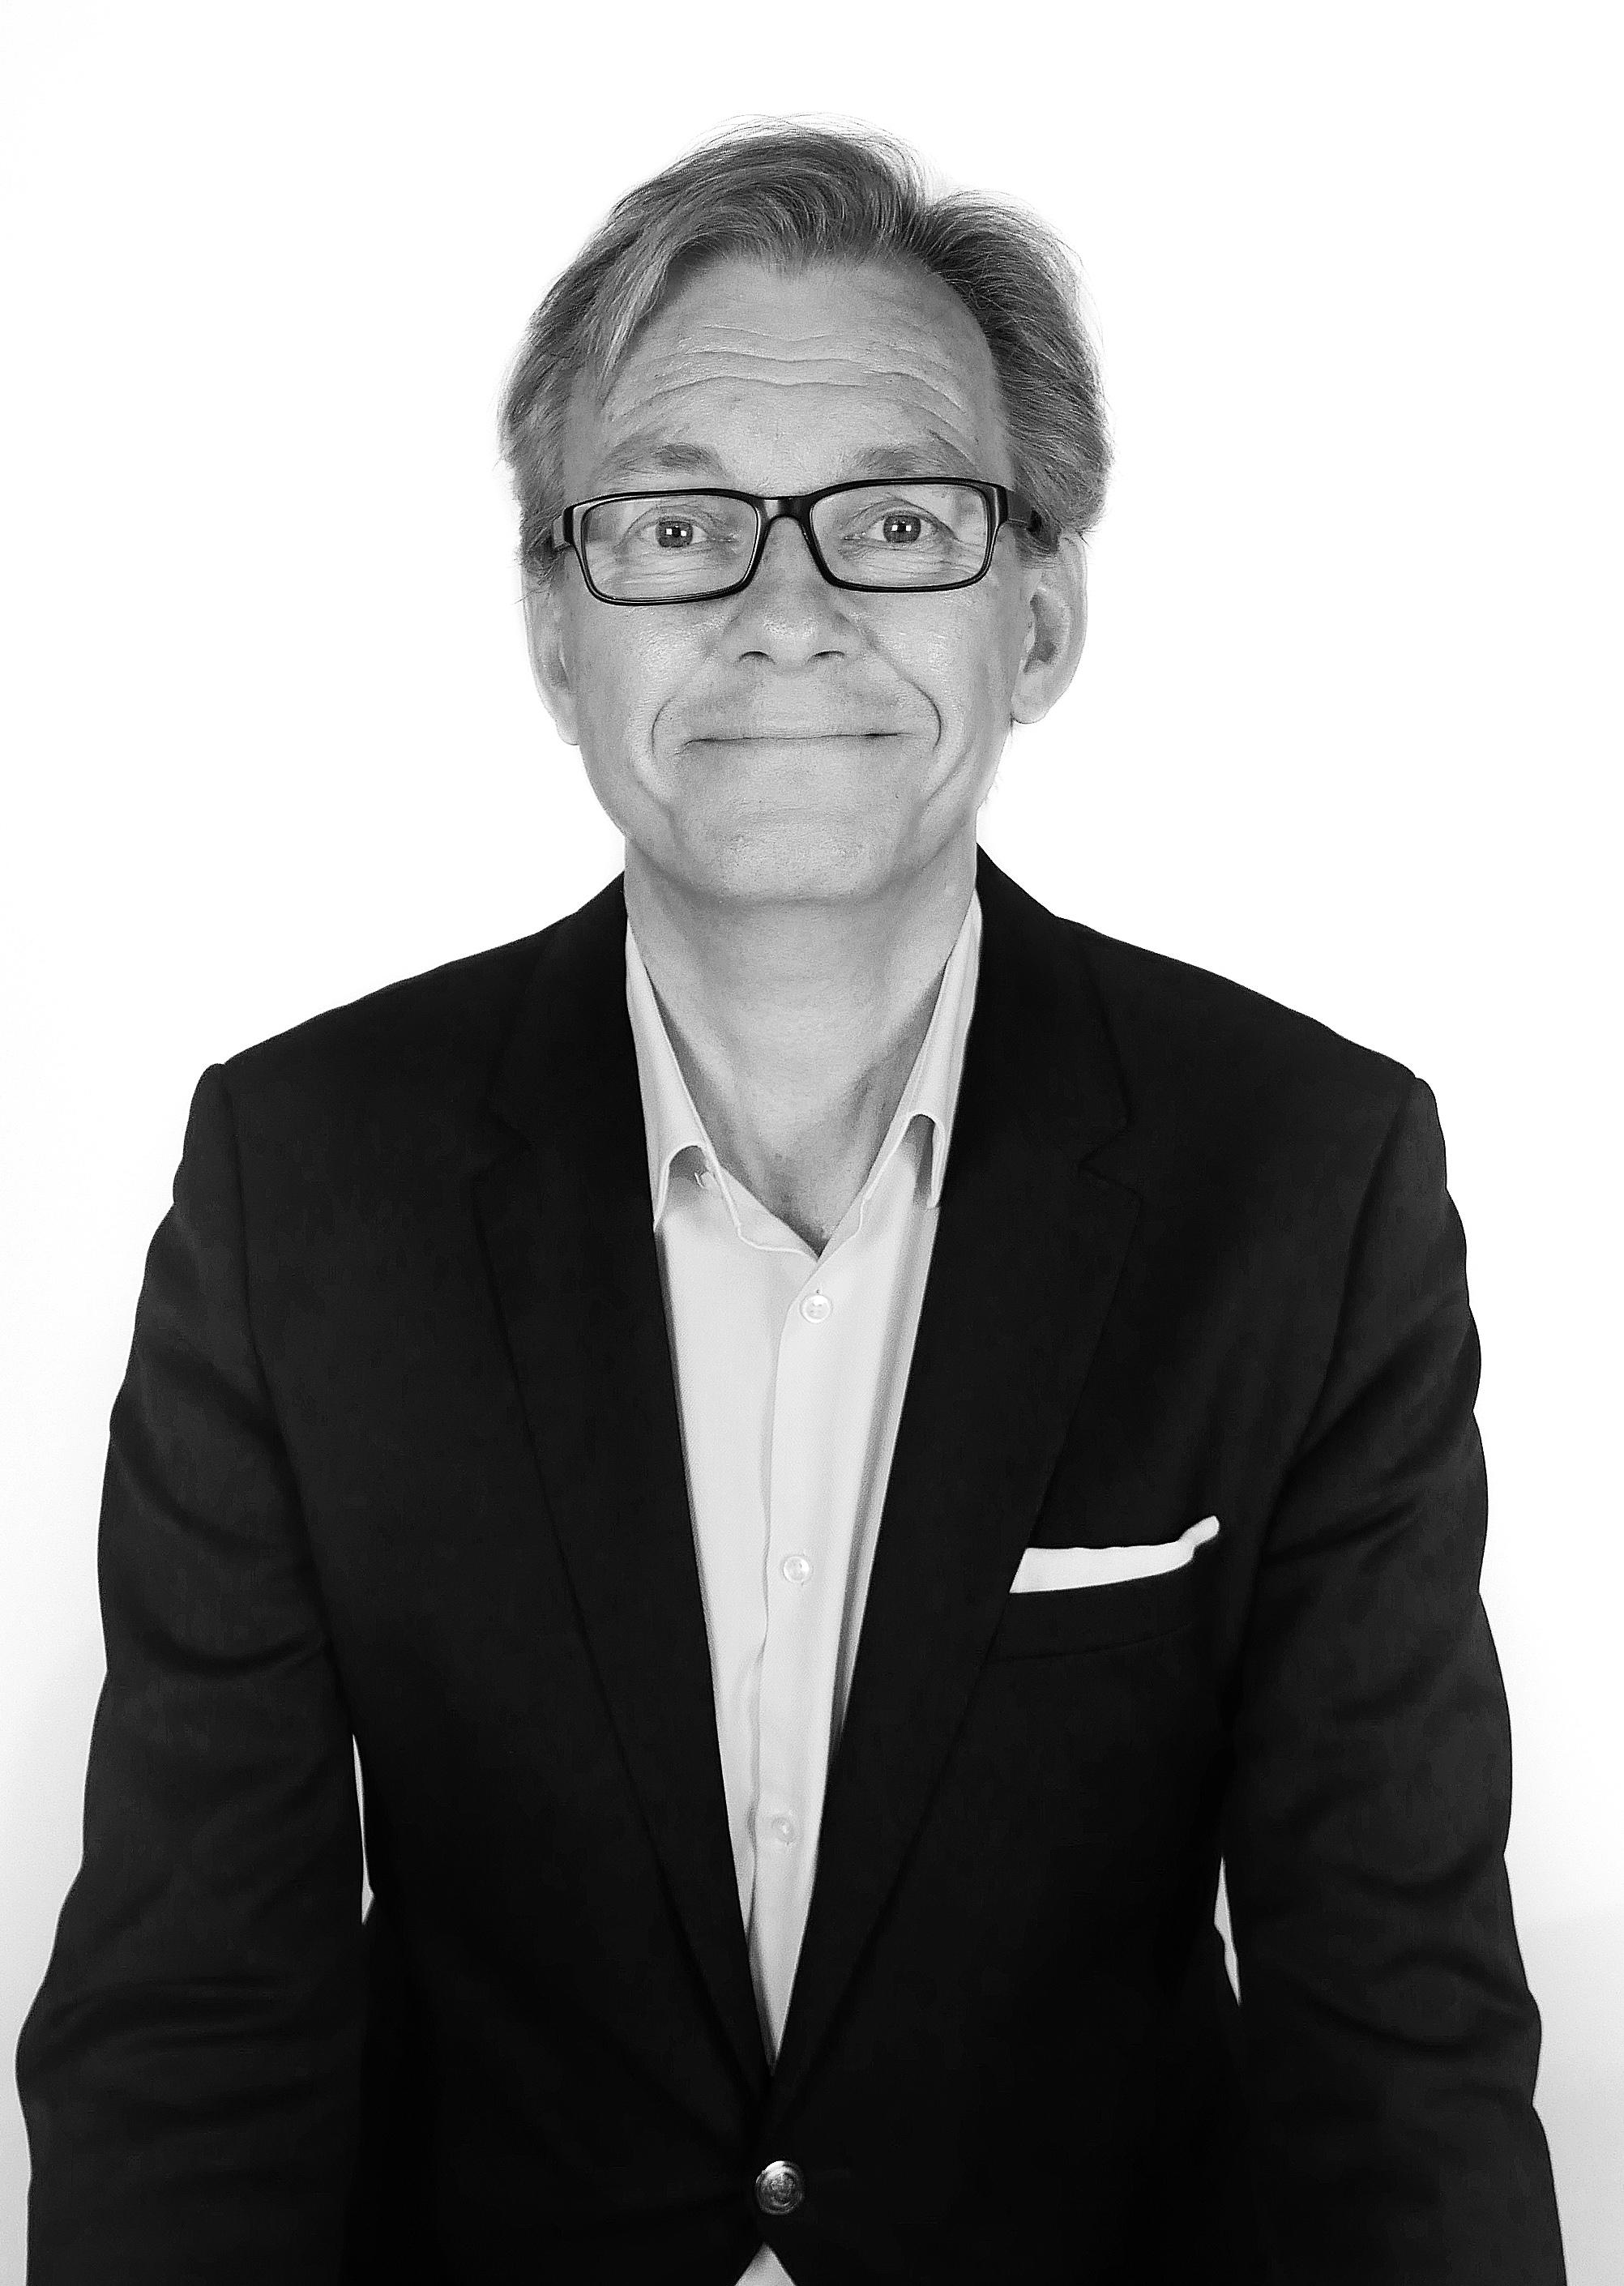 Mats Blomqvist